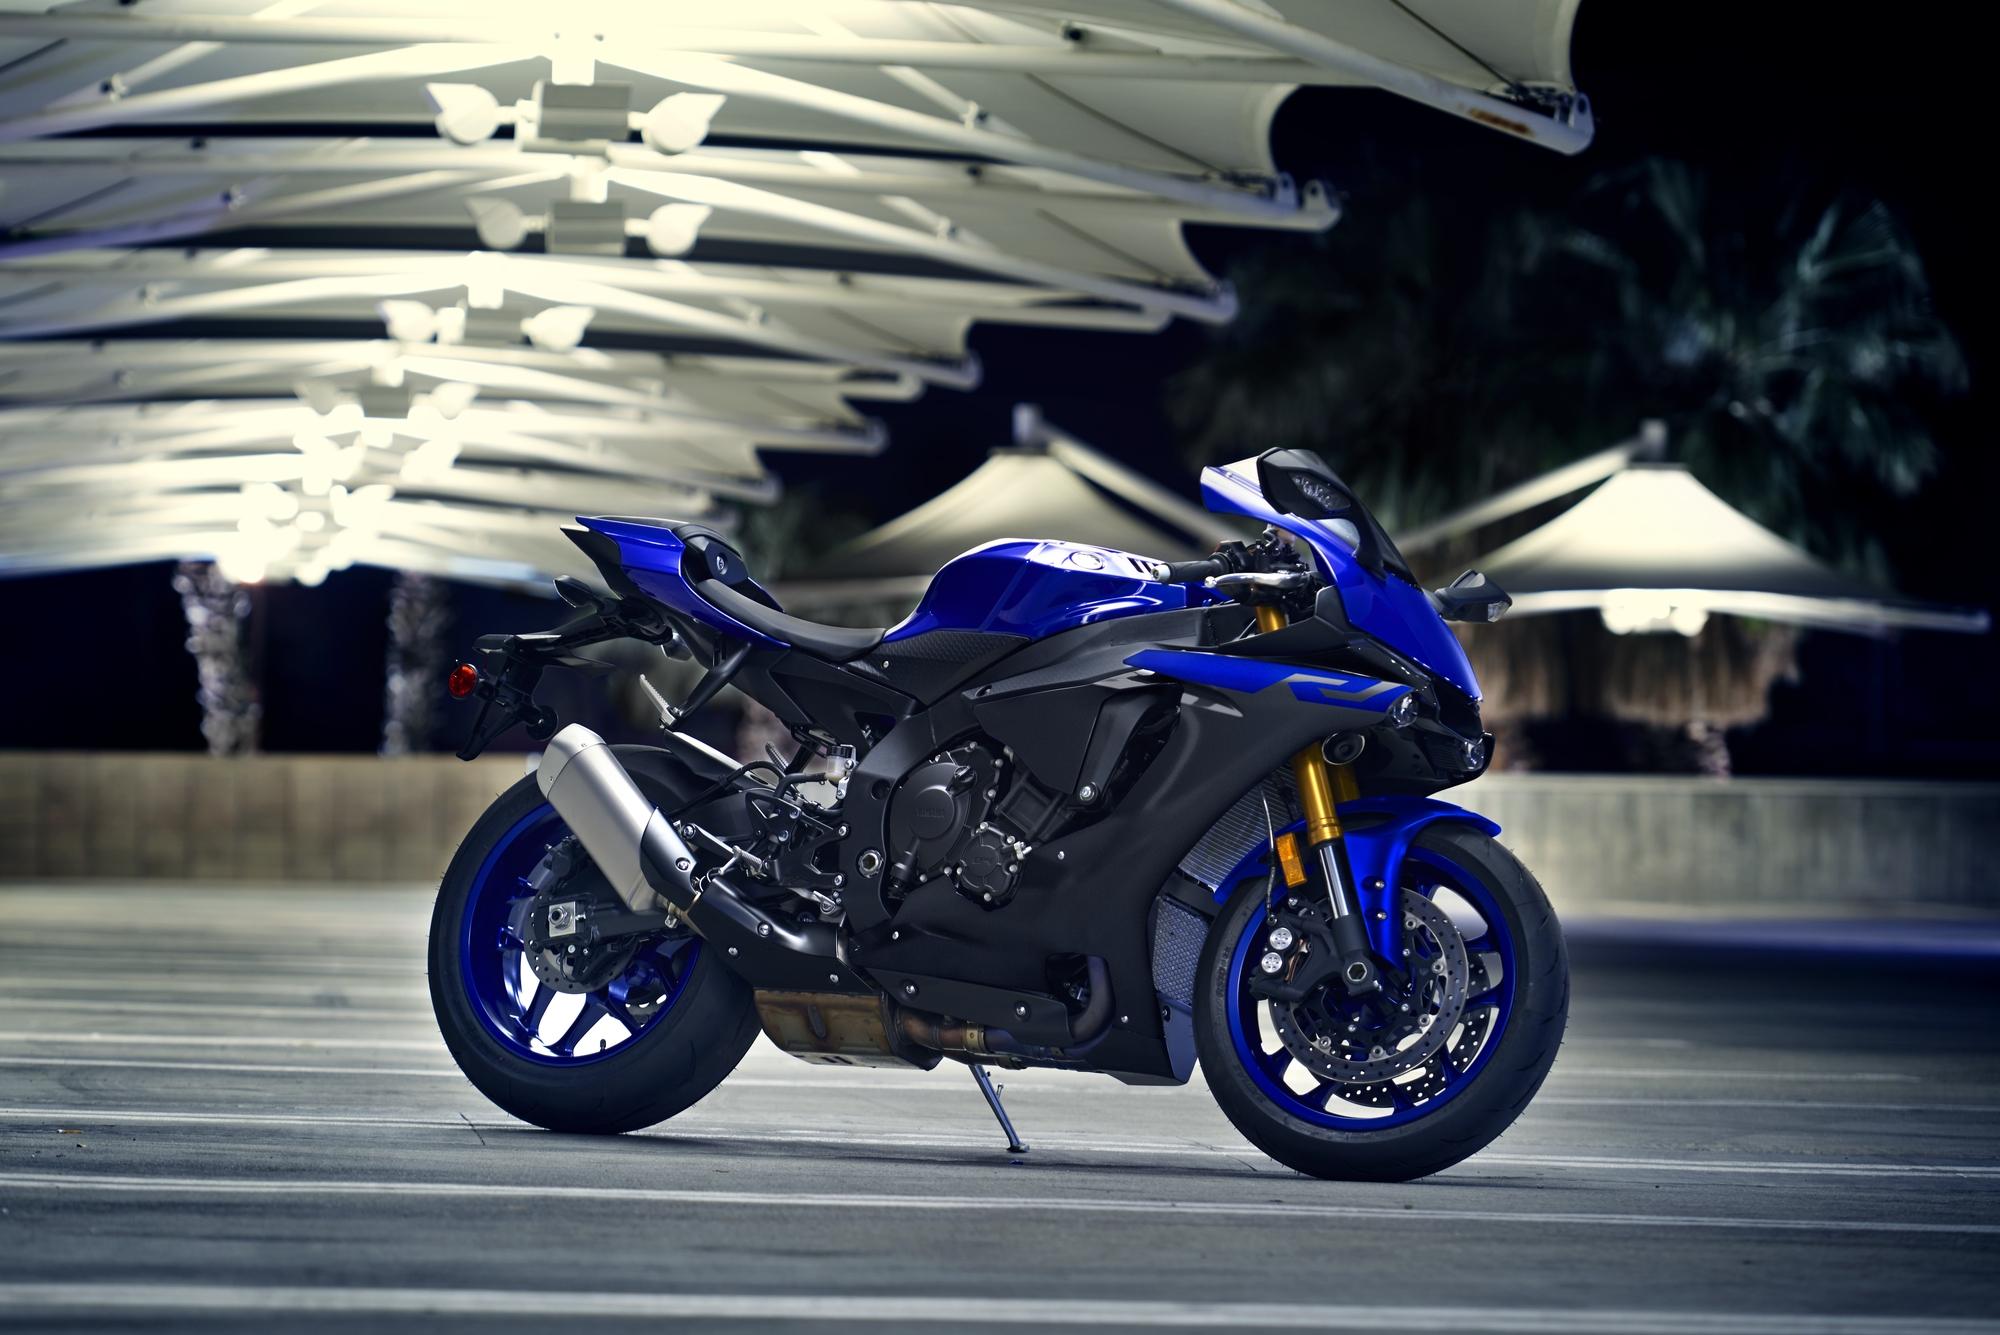 Yzf R1 Motorcycles Yamaha Motor